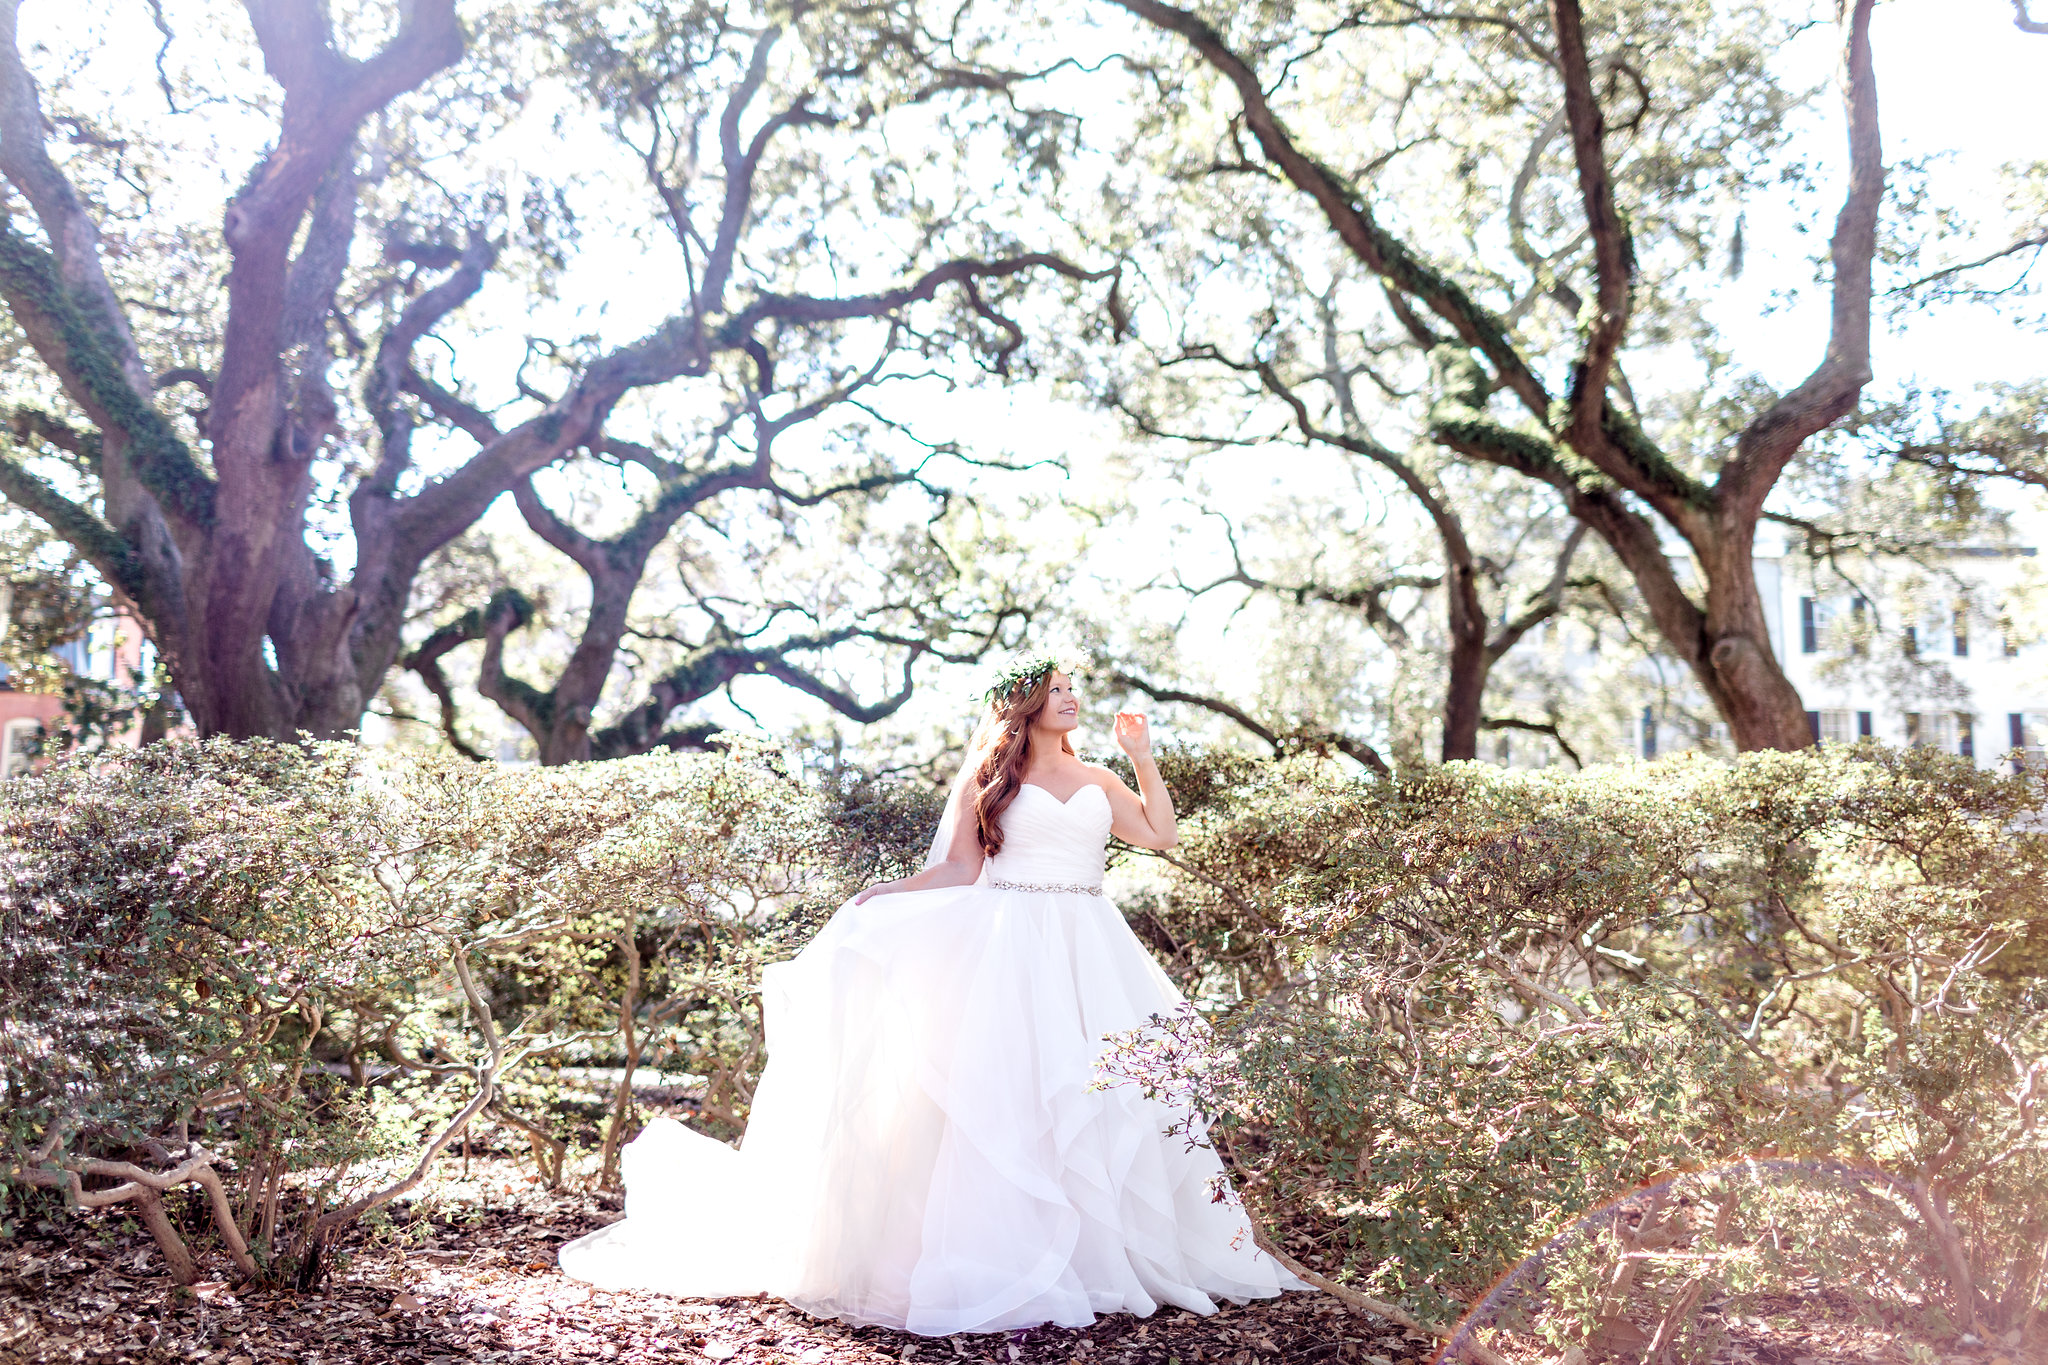 apt-b-photography-mary-elizabeths-bridal-boutique-adele-amelia-accessories-morilee-5504-savannah-bridal-boutique-savannah-weddings-savannah-wedding-photographer-savannah-bridal-gowns-savannah-wedding-dresses-historic-savannah-wedding-11.jpg